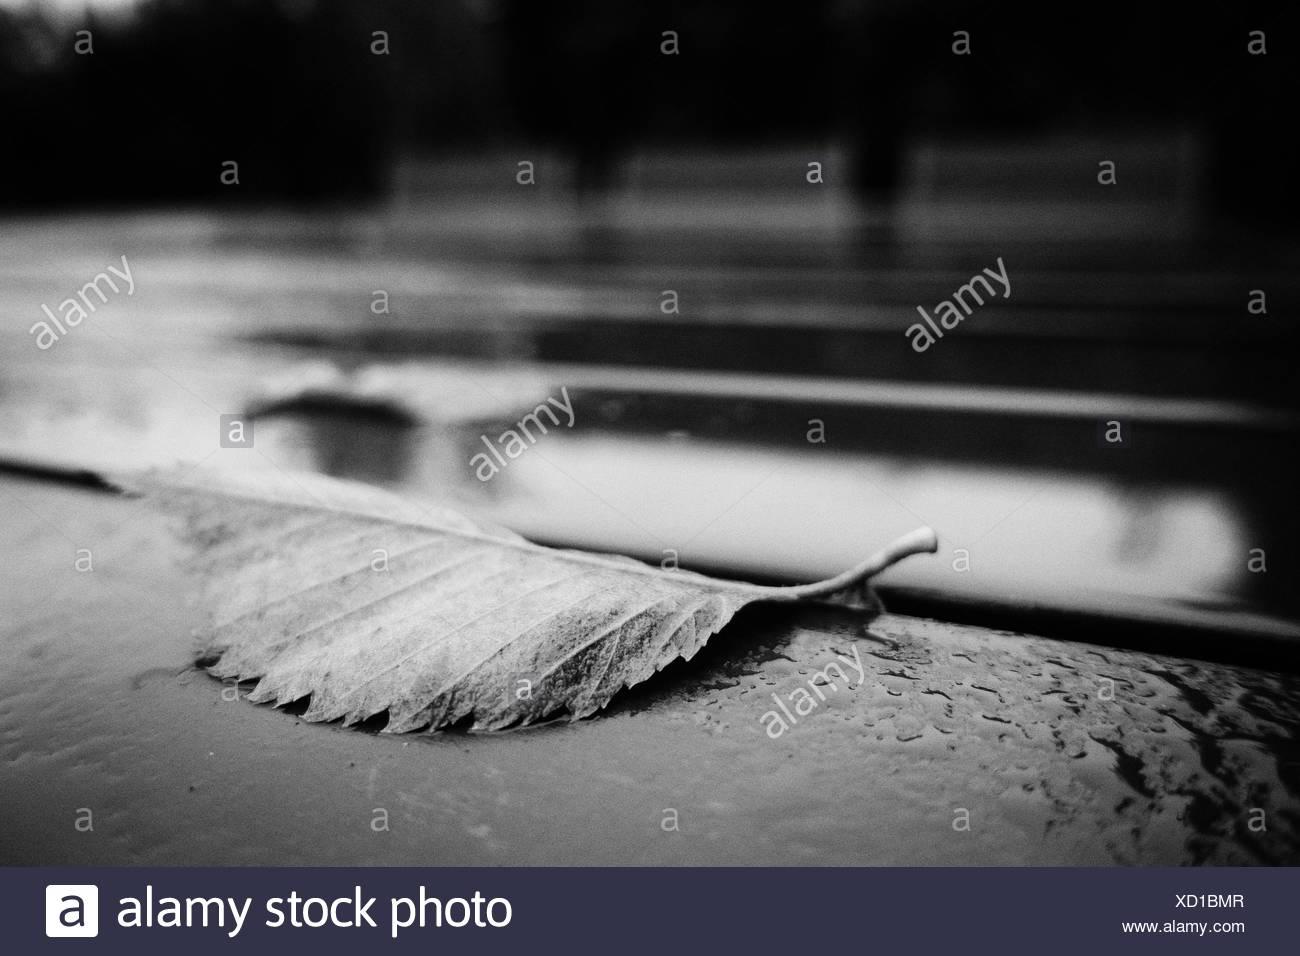 Primer plano de la hoja en Carretera mojada Imagen De Stock